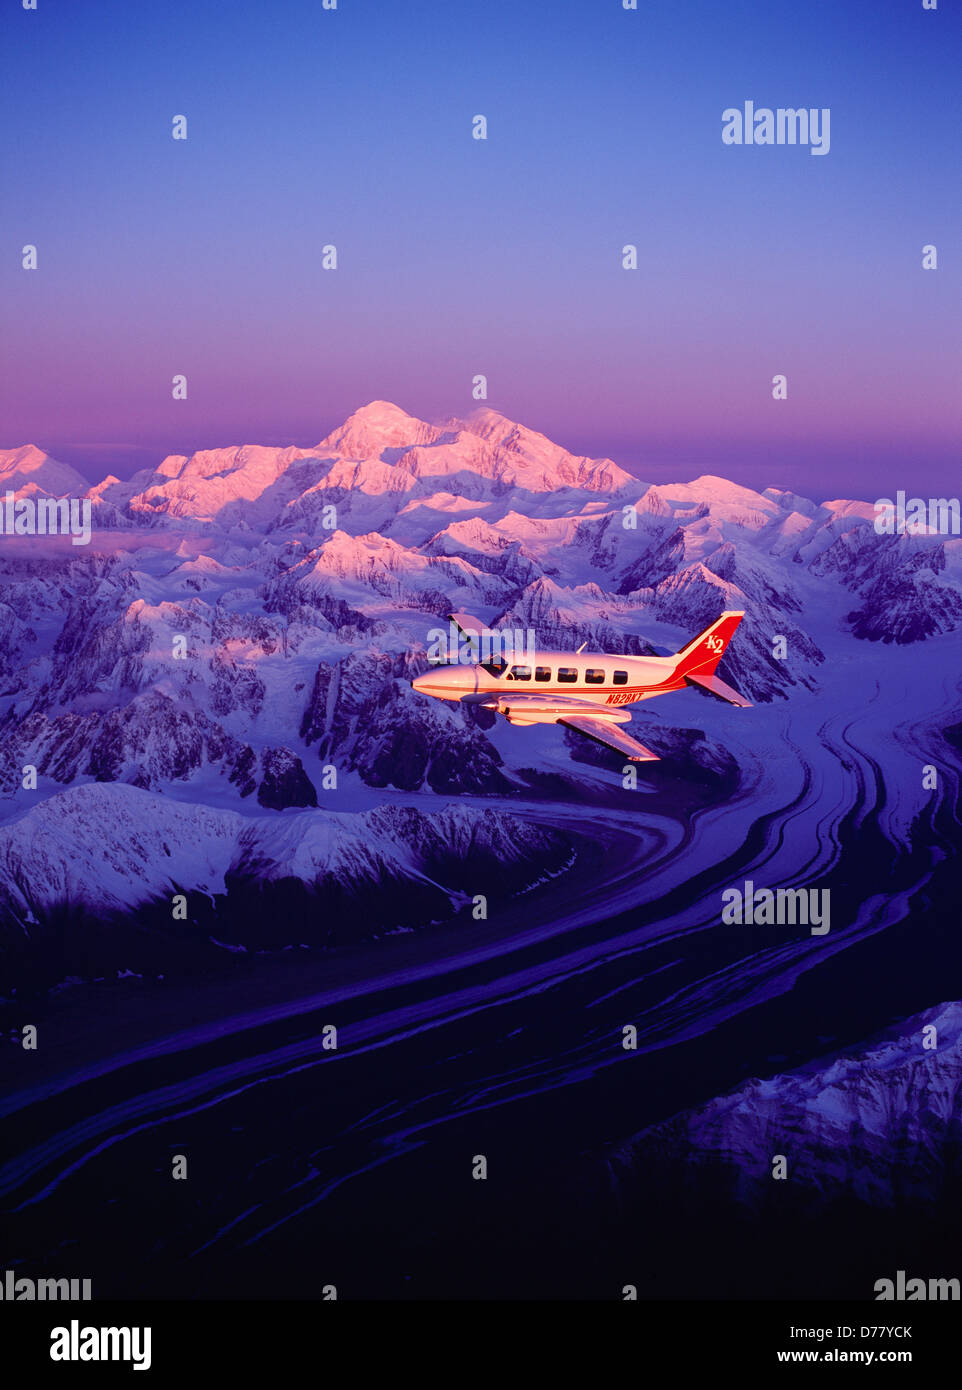 K2 Aviation's Piper Navajo Chieftain flying above Eldridge Glacier early light sunrise striking 20,320 foot - Stock Image